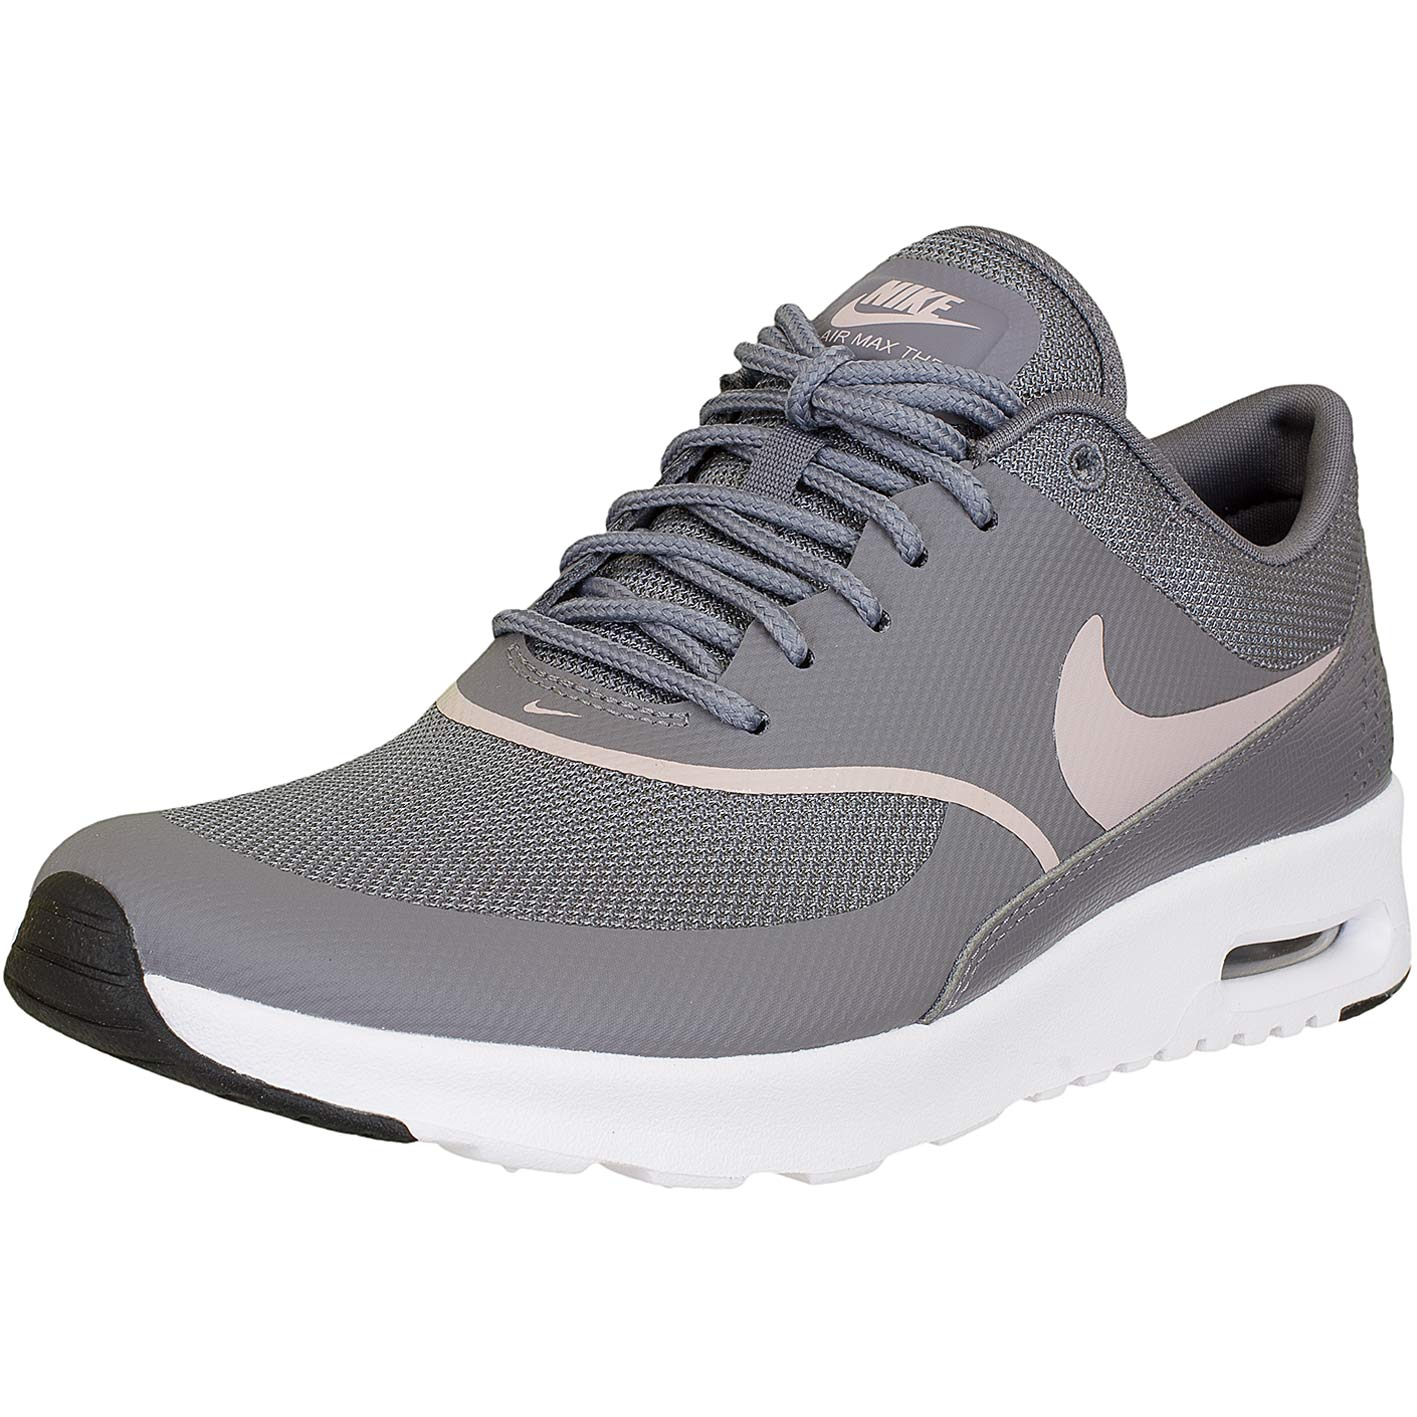 ☆ Nike Damen Sneaker Air Max Thea smoke/rose - hier bestellen!